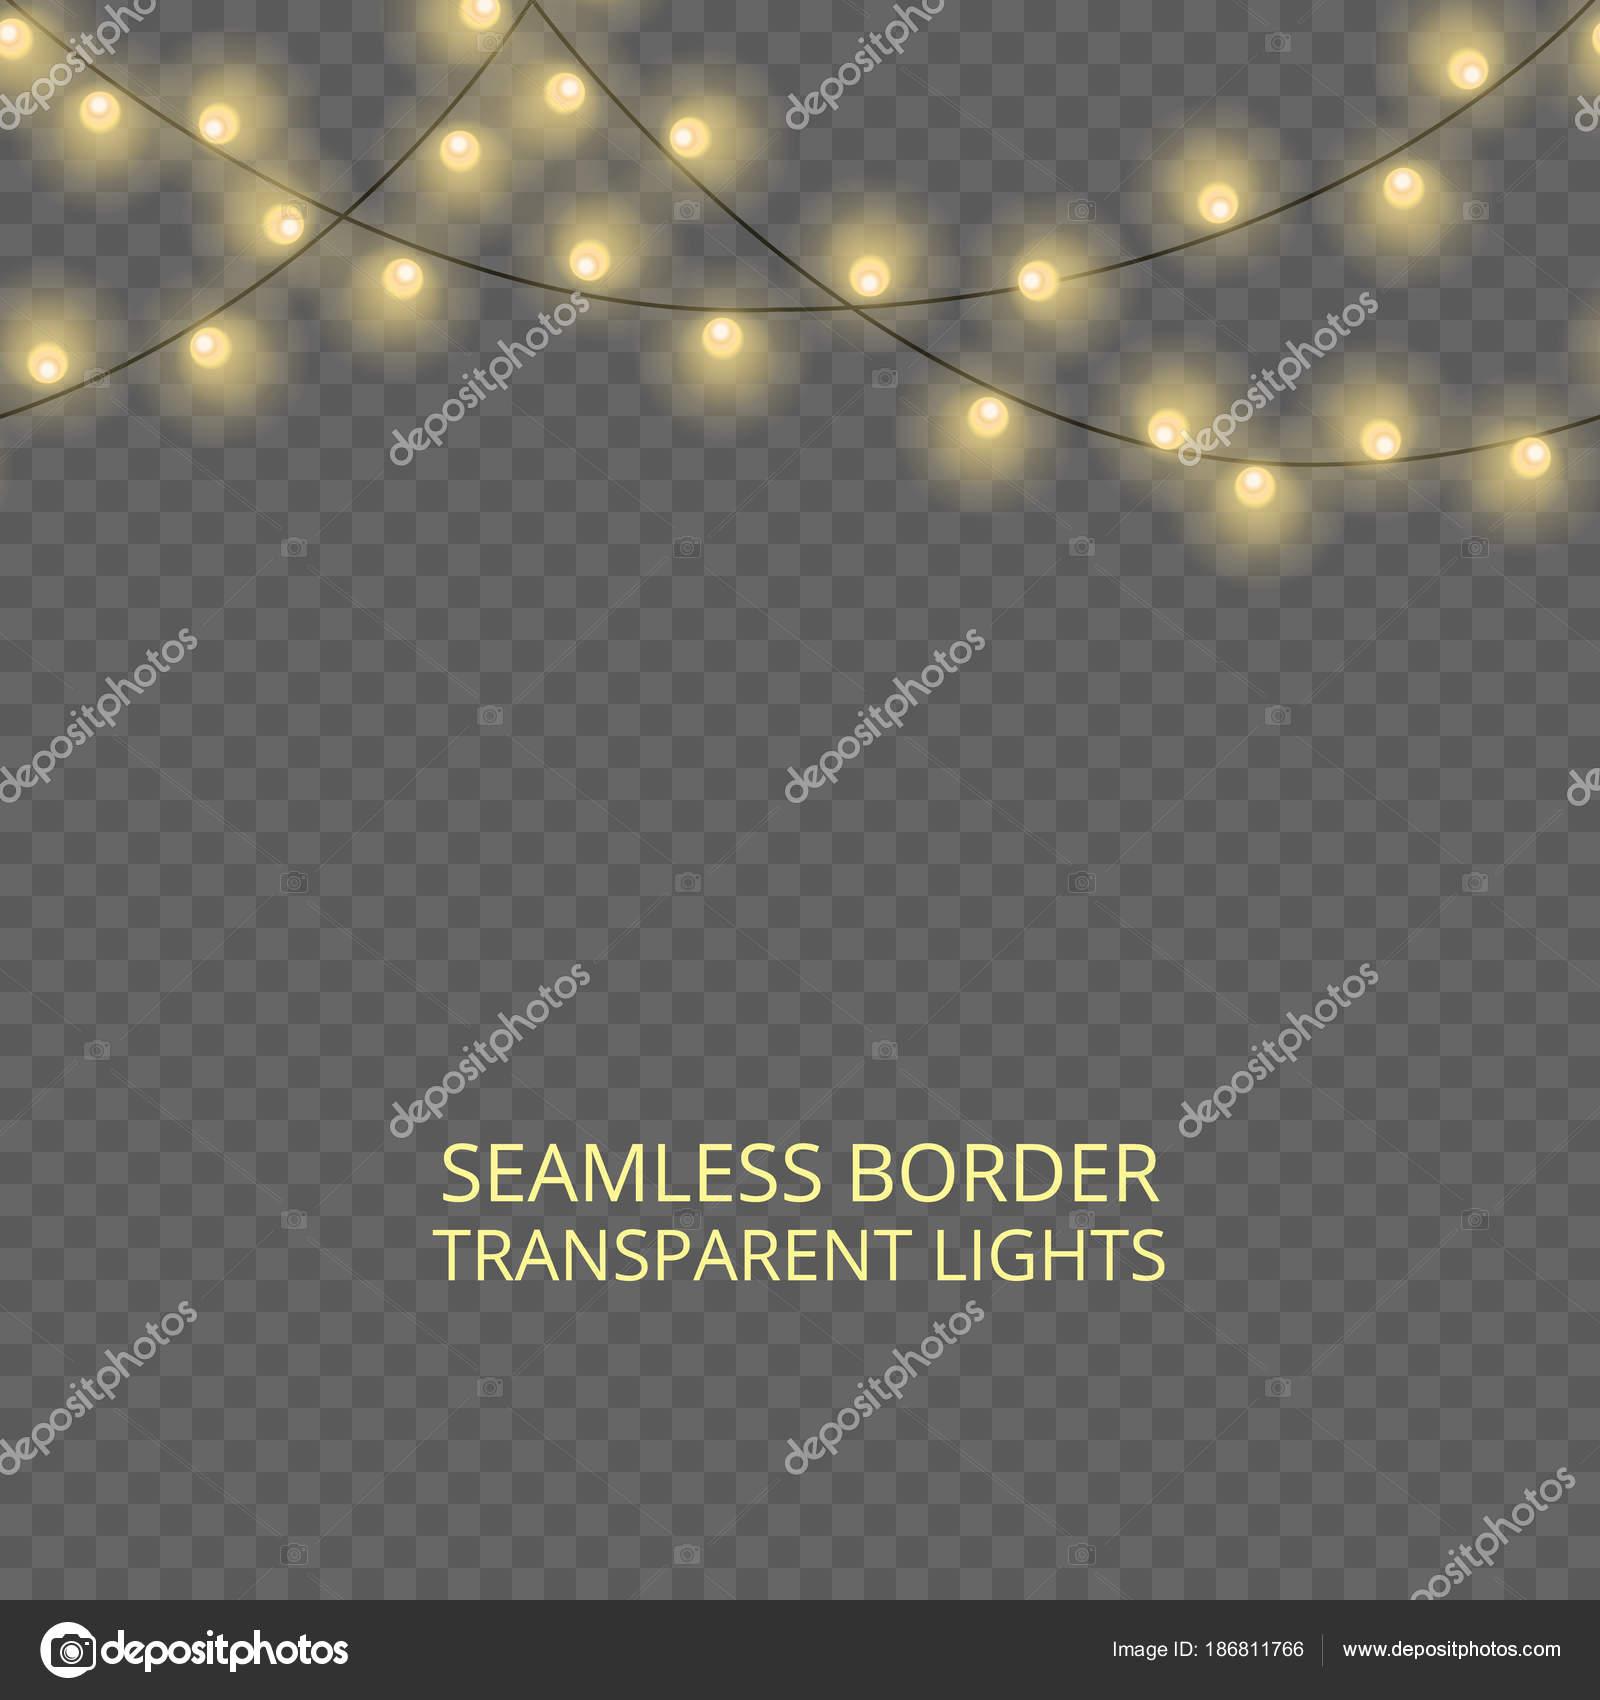 Transparent Lights Garland Seamless Border Festive Decoration